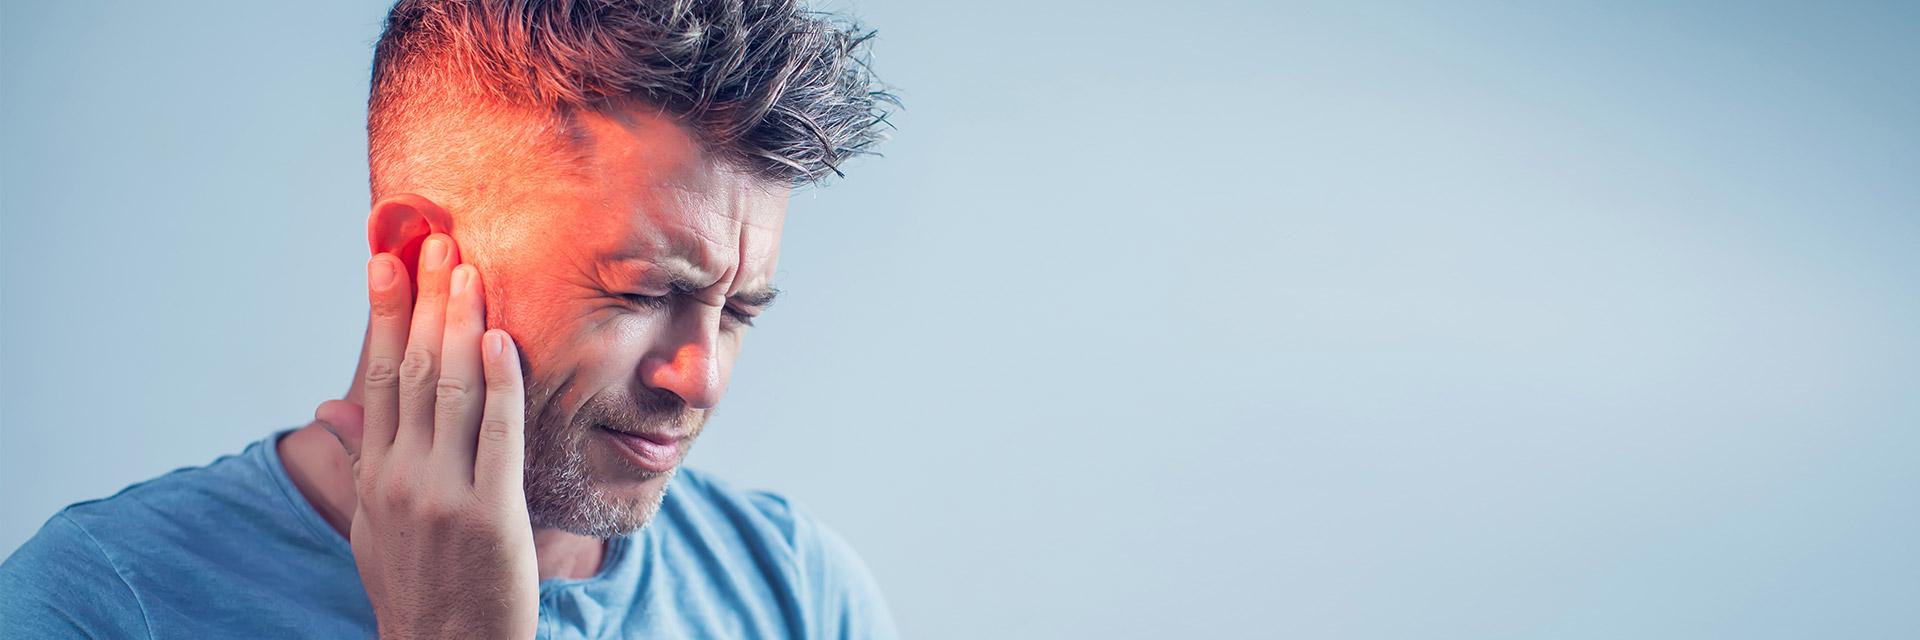 CVH Audiology | Tinnitus Treatment